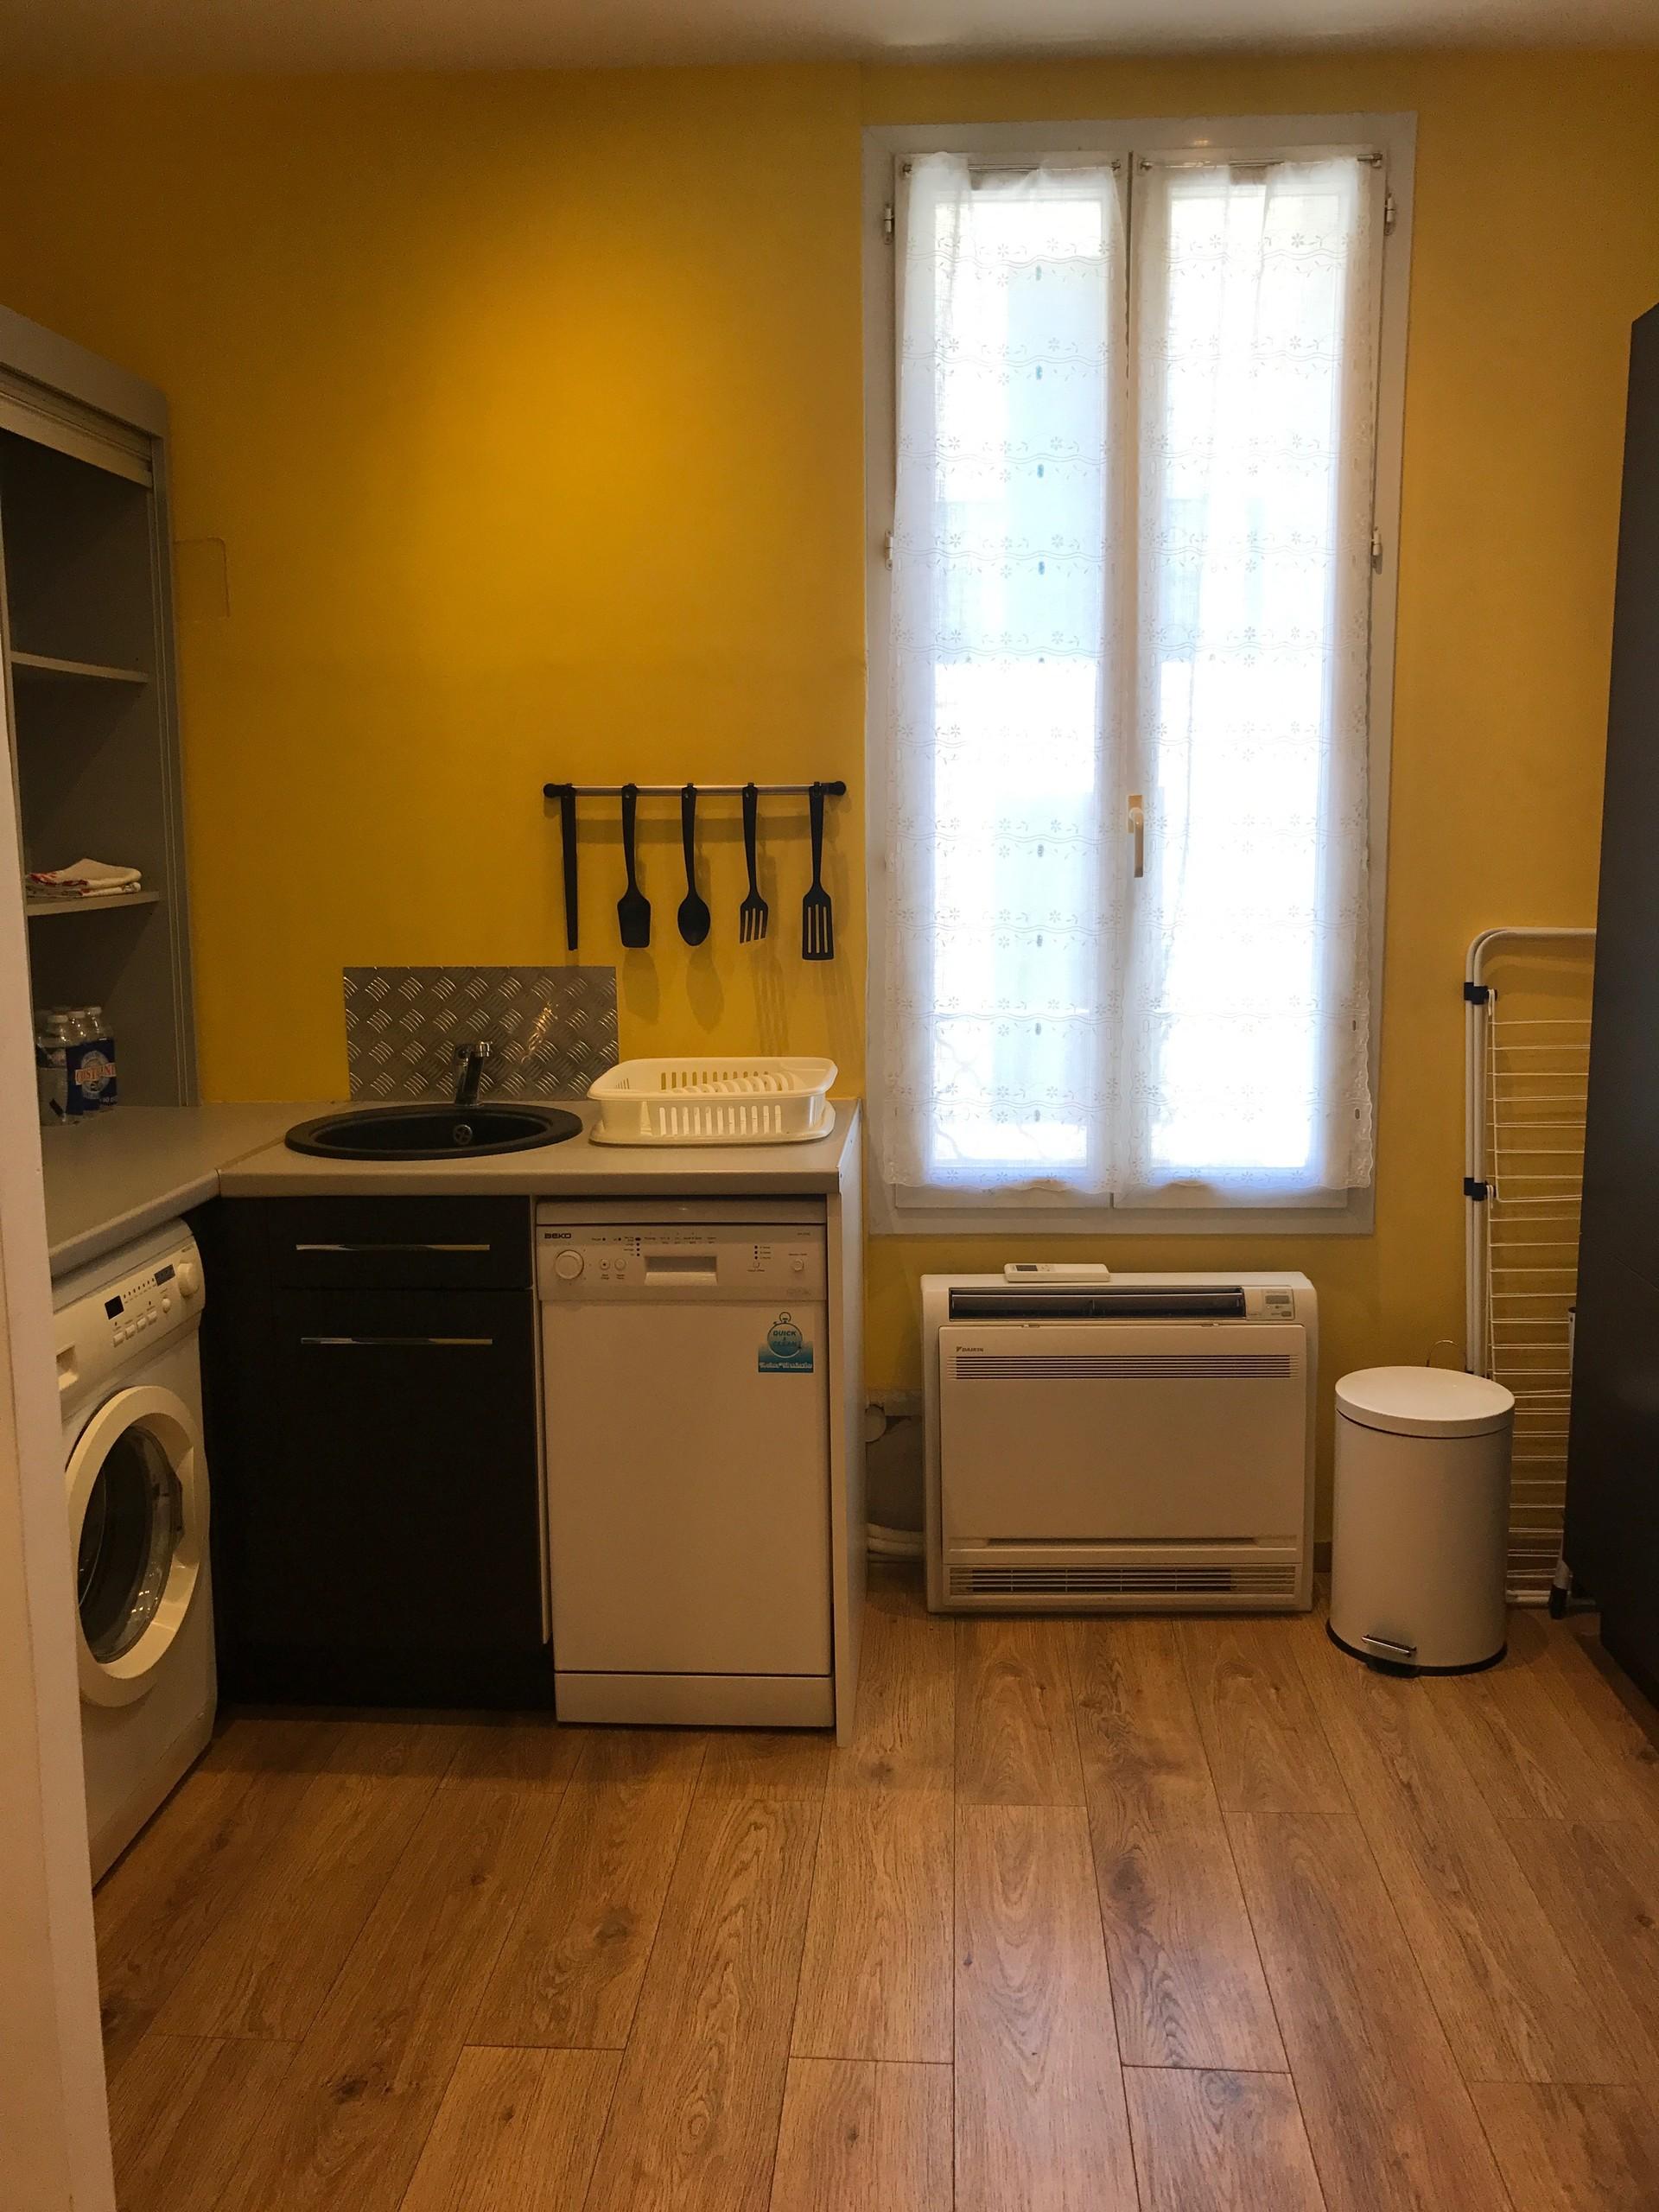 3 Rue Louis Figuier, 34000 Montpellier, France